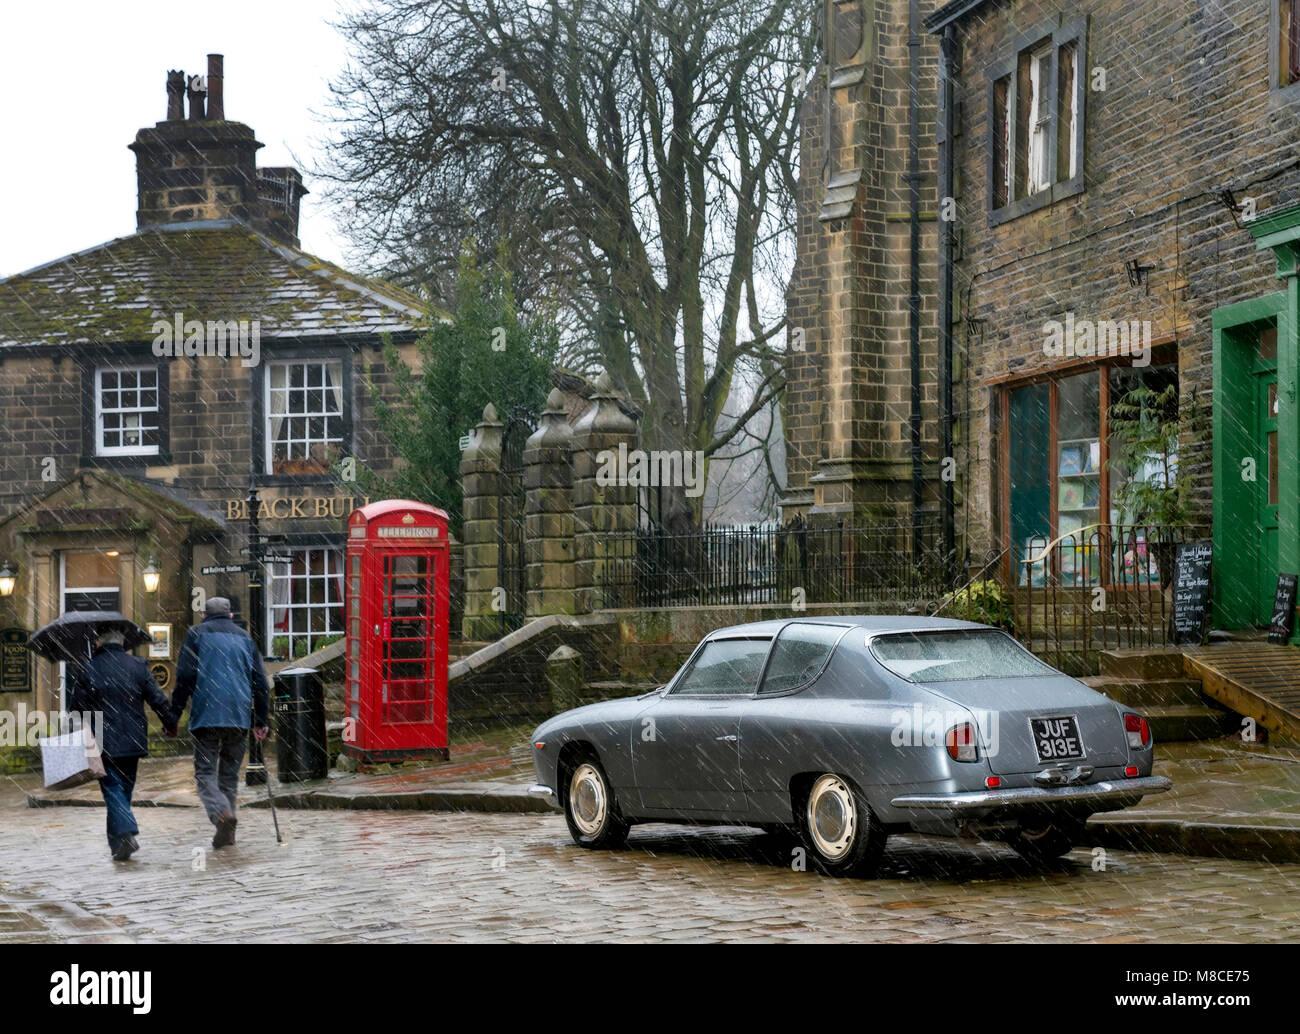 http://c8.alamy.com/comp/M8CE75/1967-lancia-flavia-zagato-in-main-street-haworth-west-yorkshire-M8CE75.jpg